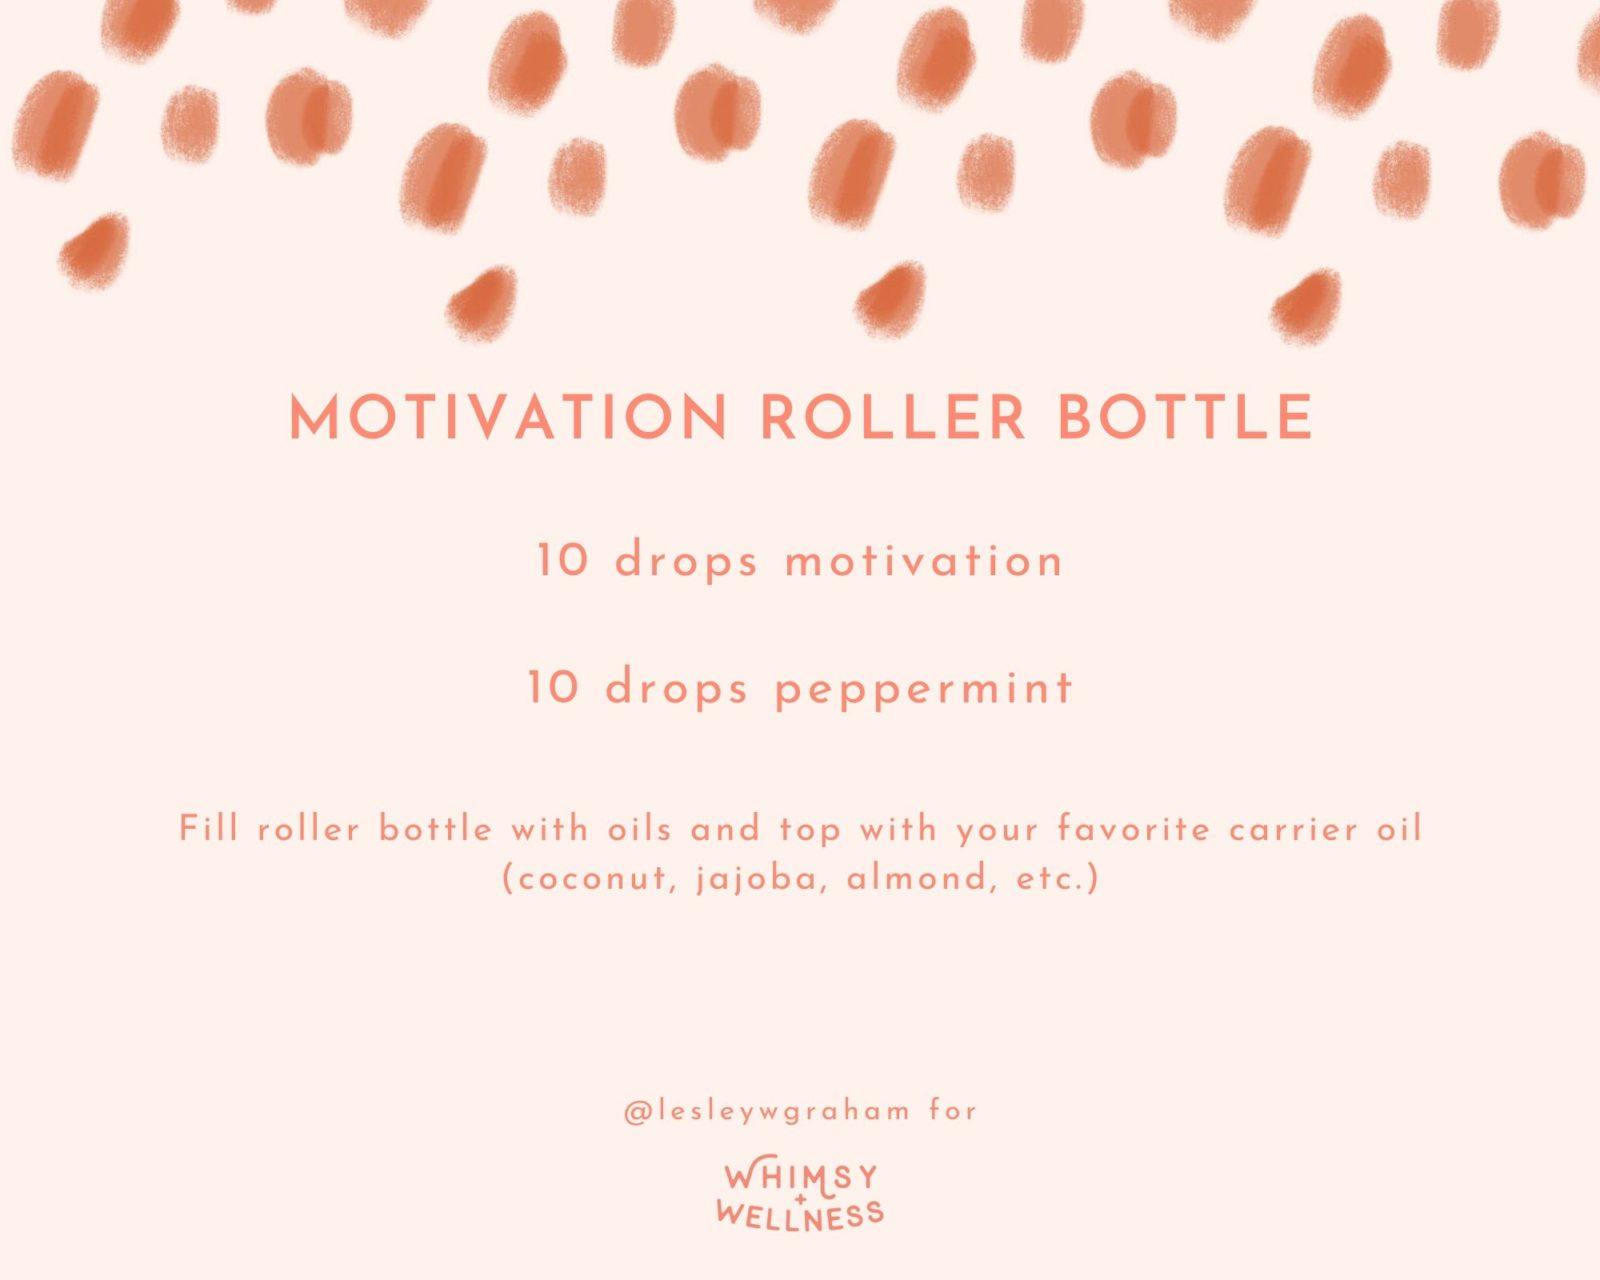 Motivation Roller Bottle Blend Lesley W Graham Young Living Crown Diamond Whimsy + Wellness